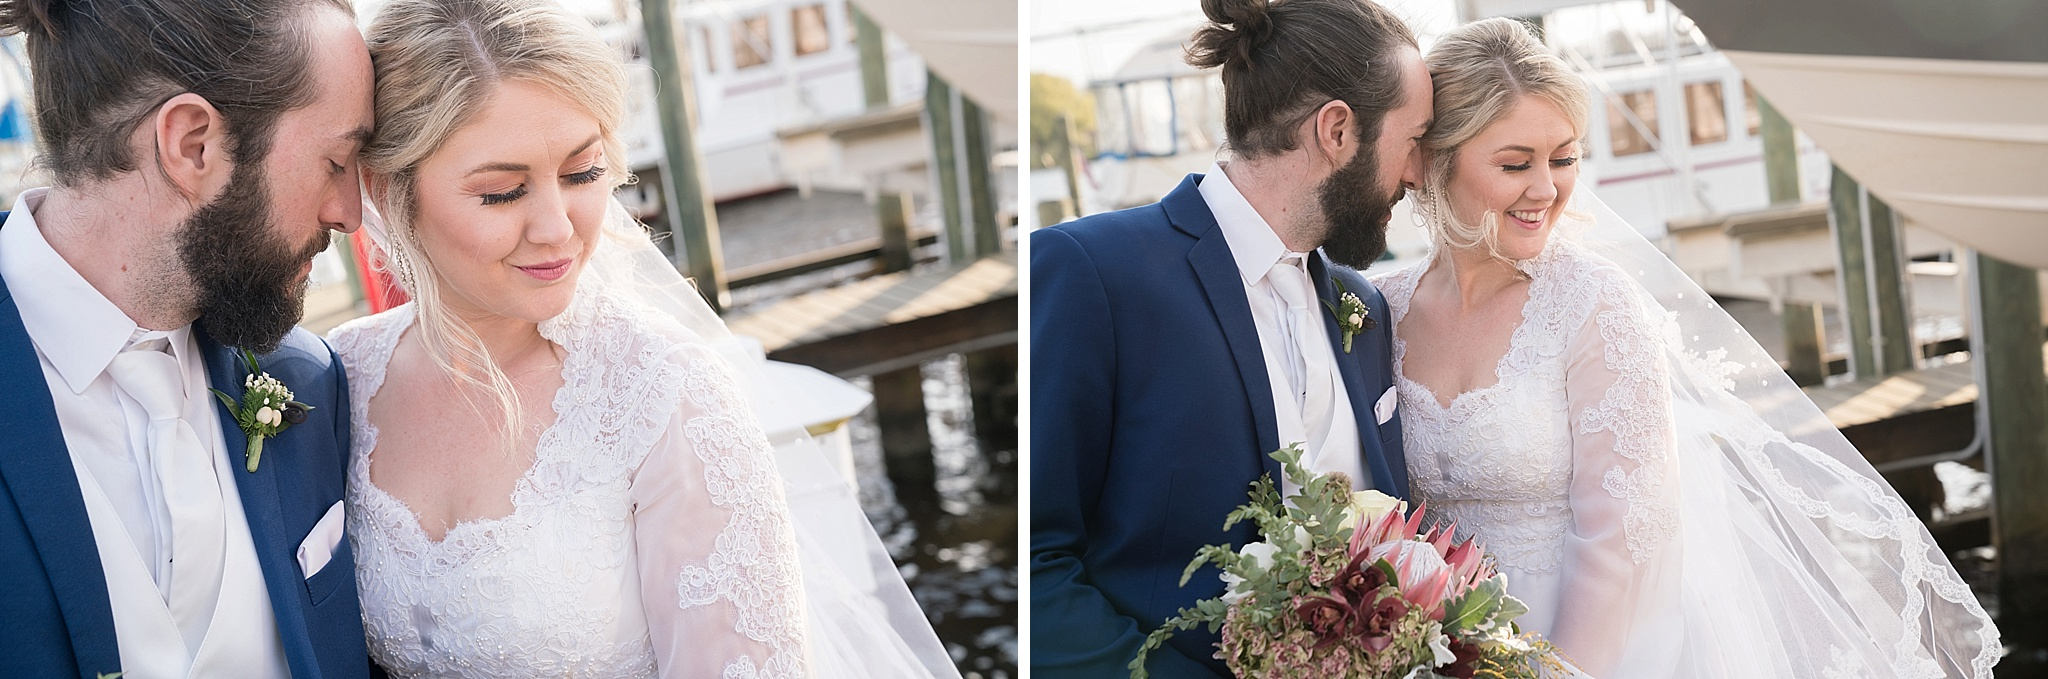 Washington-NC-Wedding-Photography-202.jpg